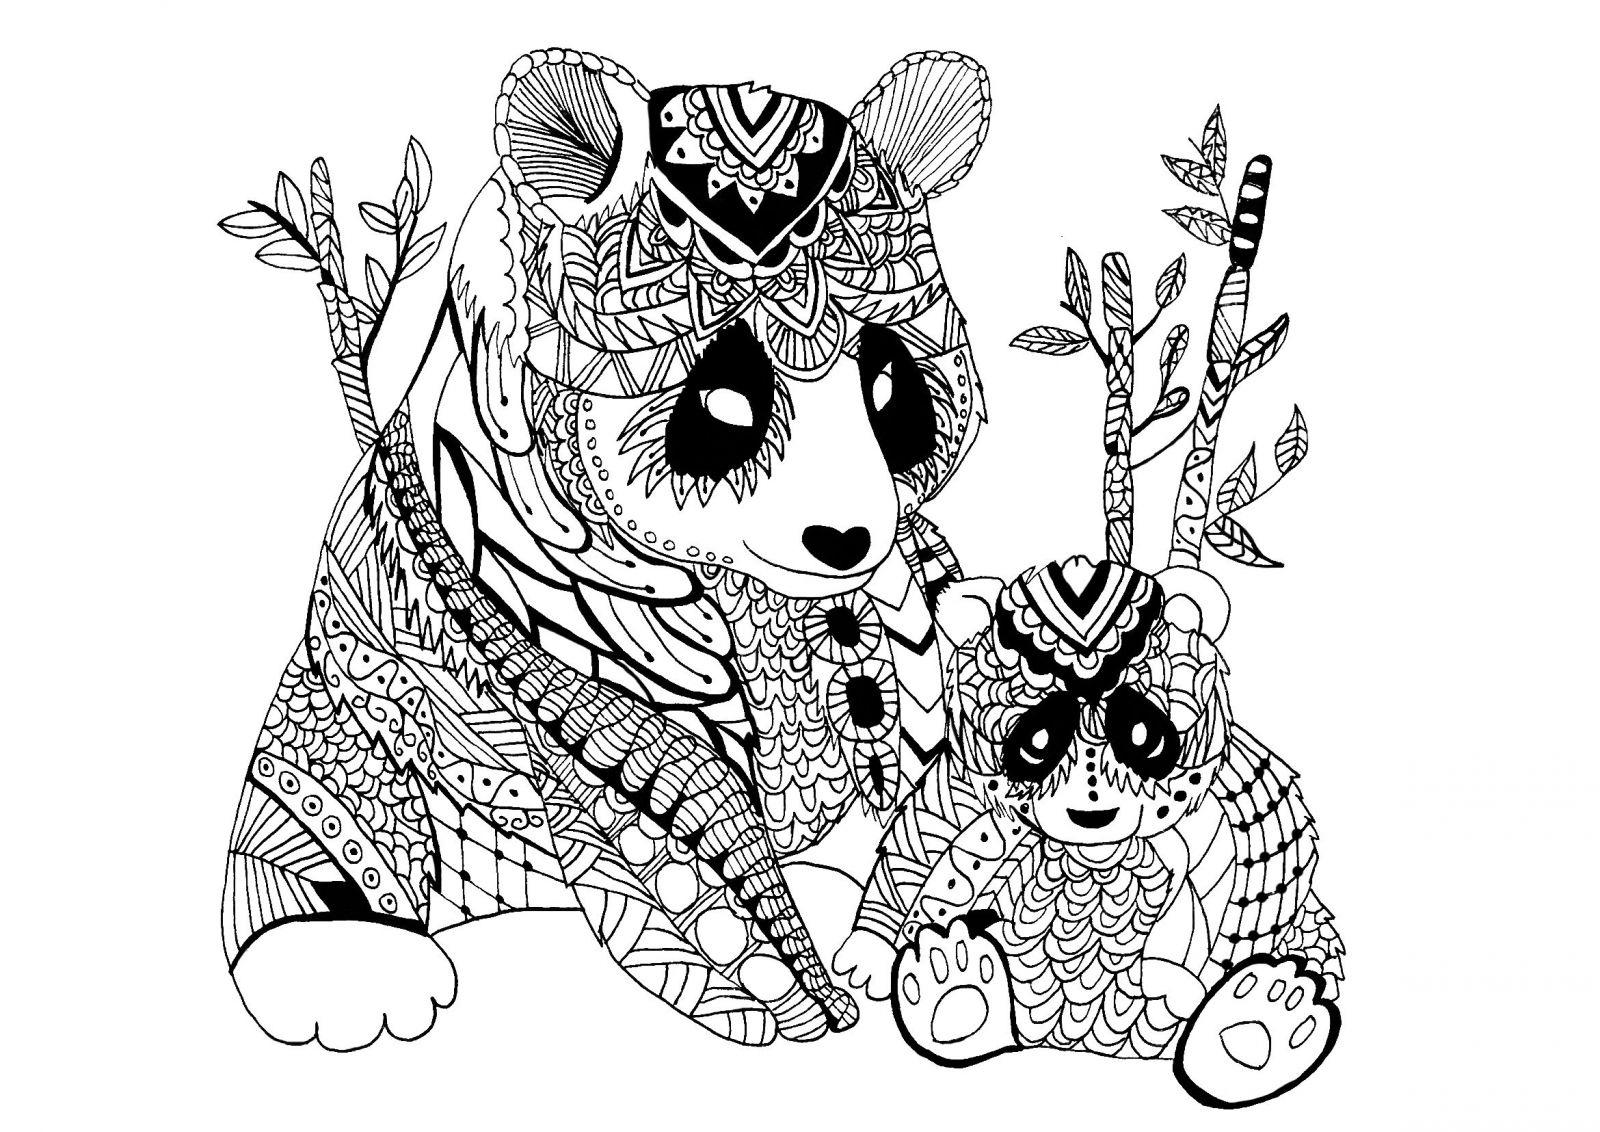 Coloriage Mandala Panda Facile | Coloriages À Imprimer Gratuits serapportantà Mandala Facile À Imprimer